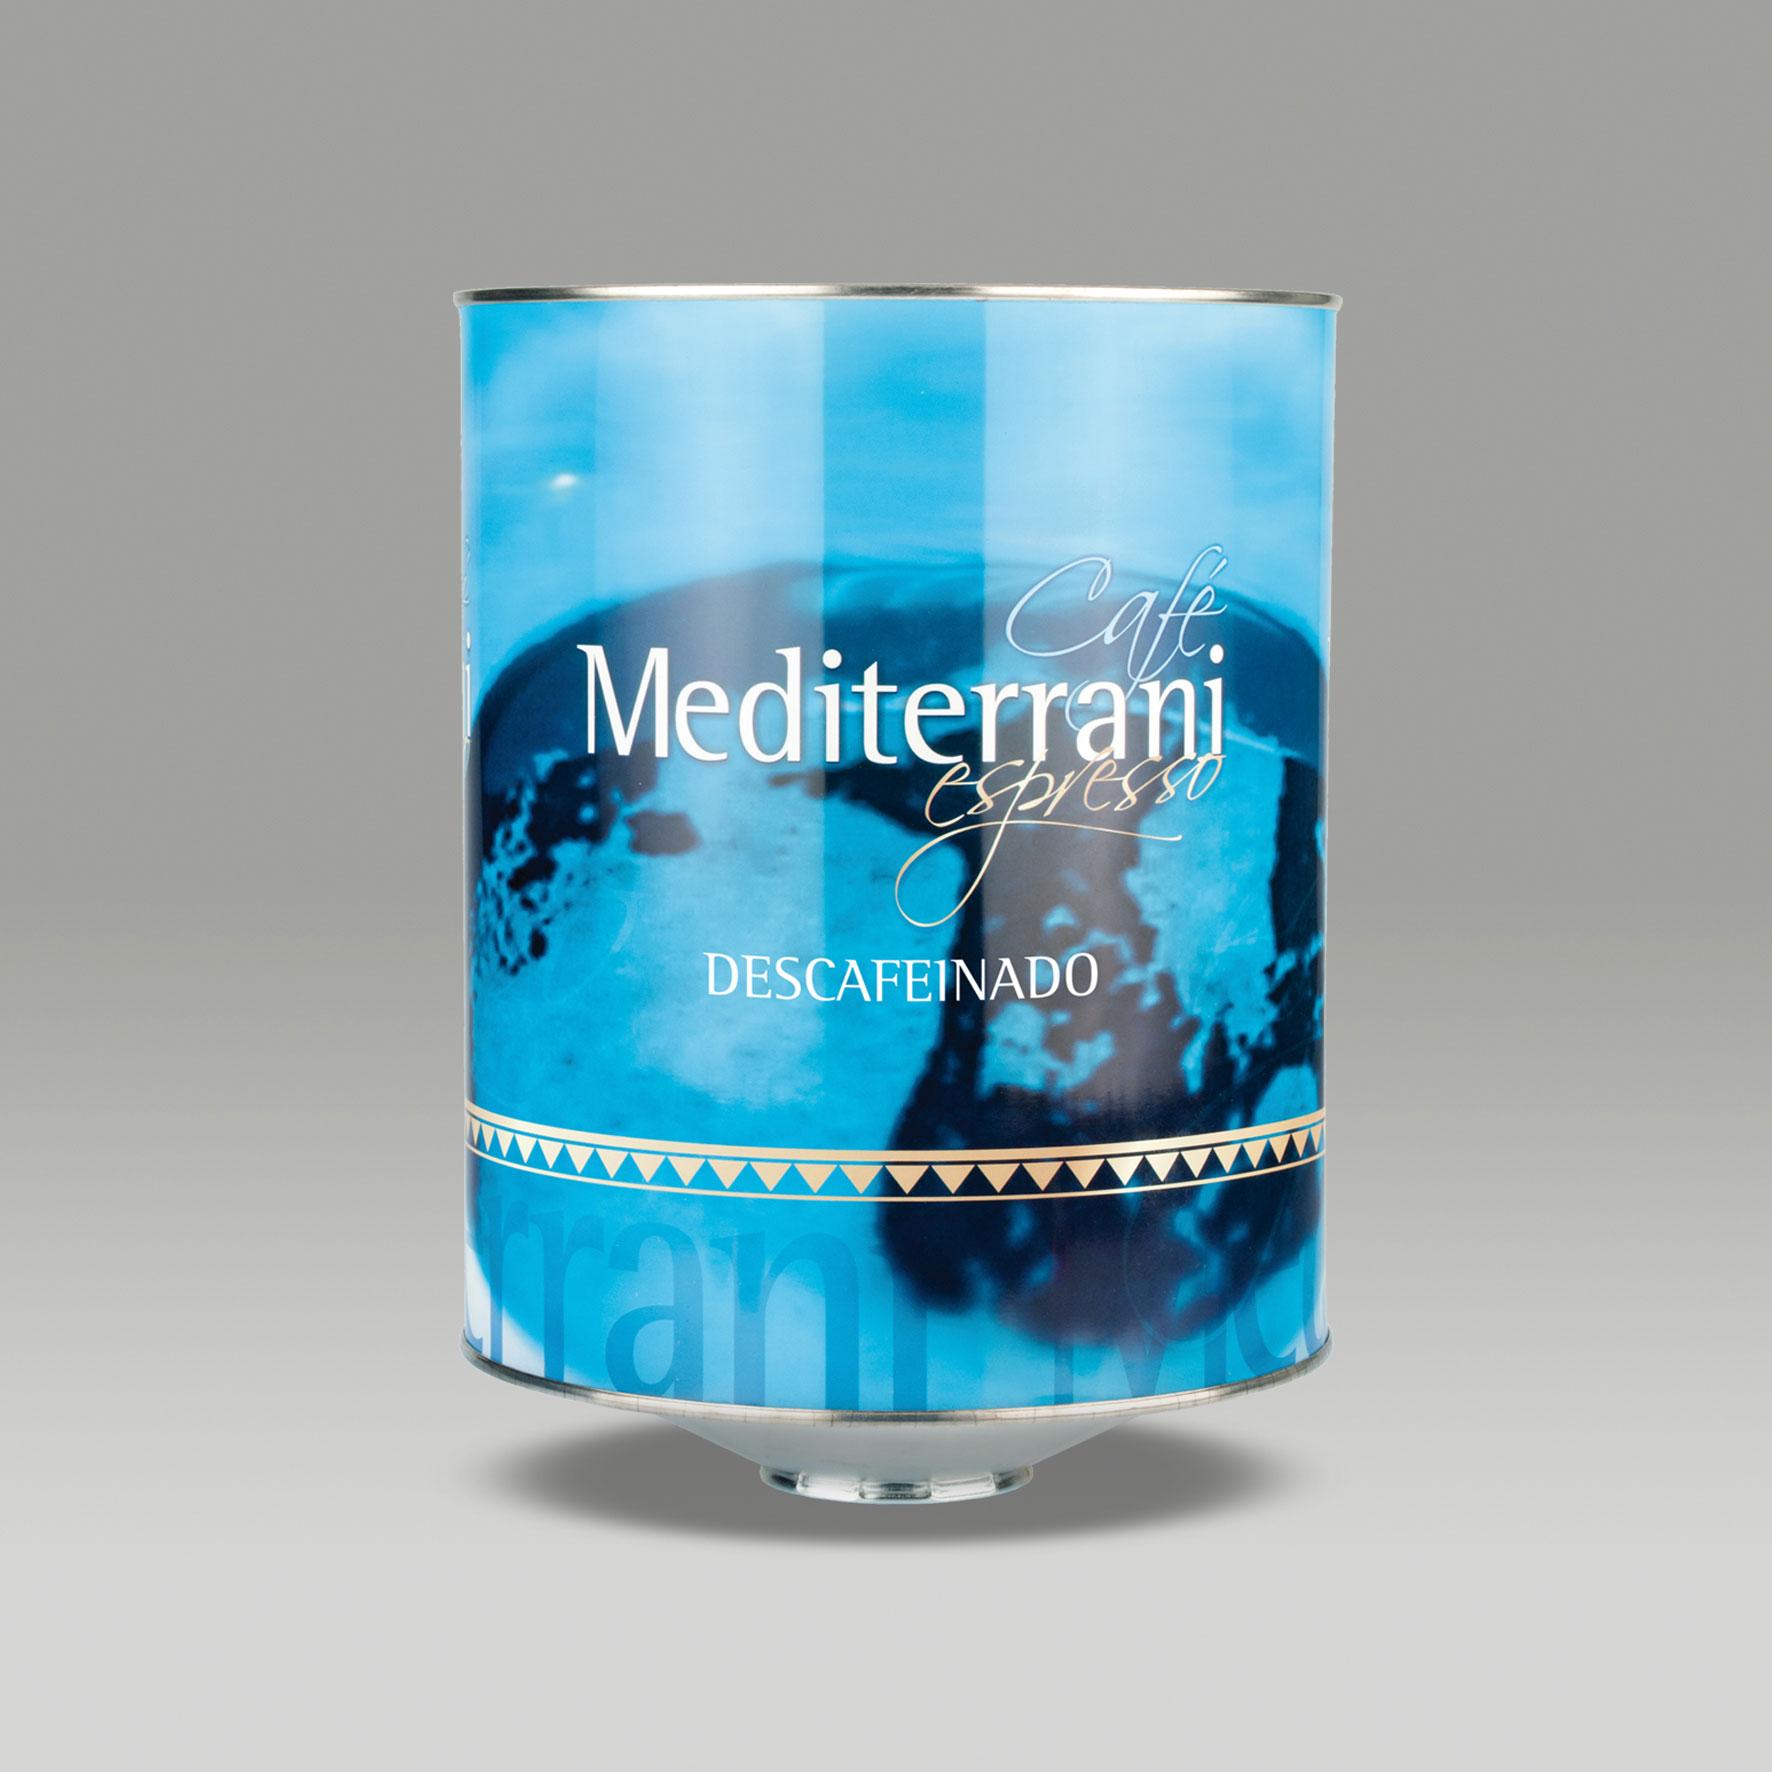 Mediterrani-Bote-descafeinado